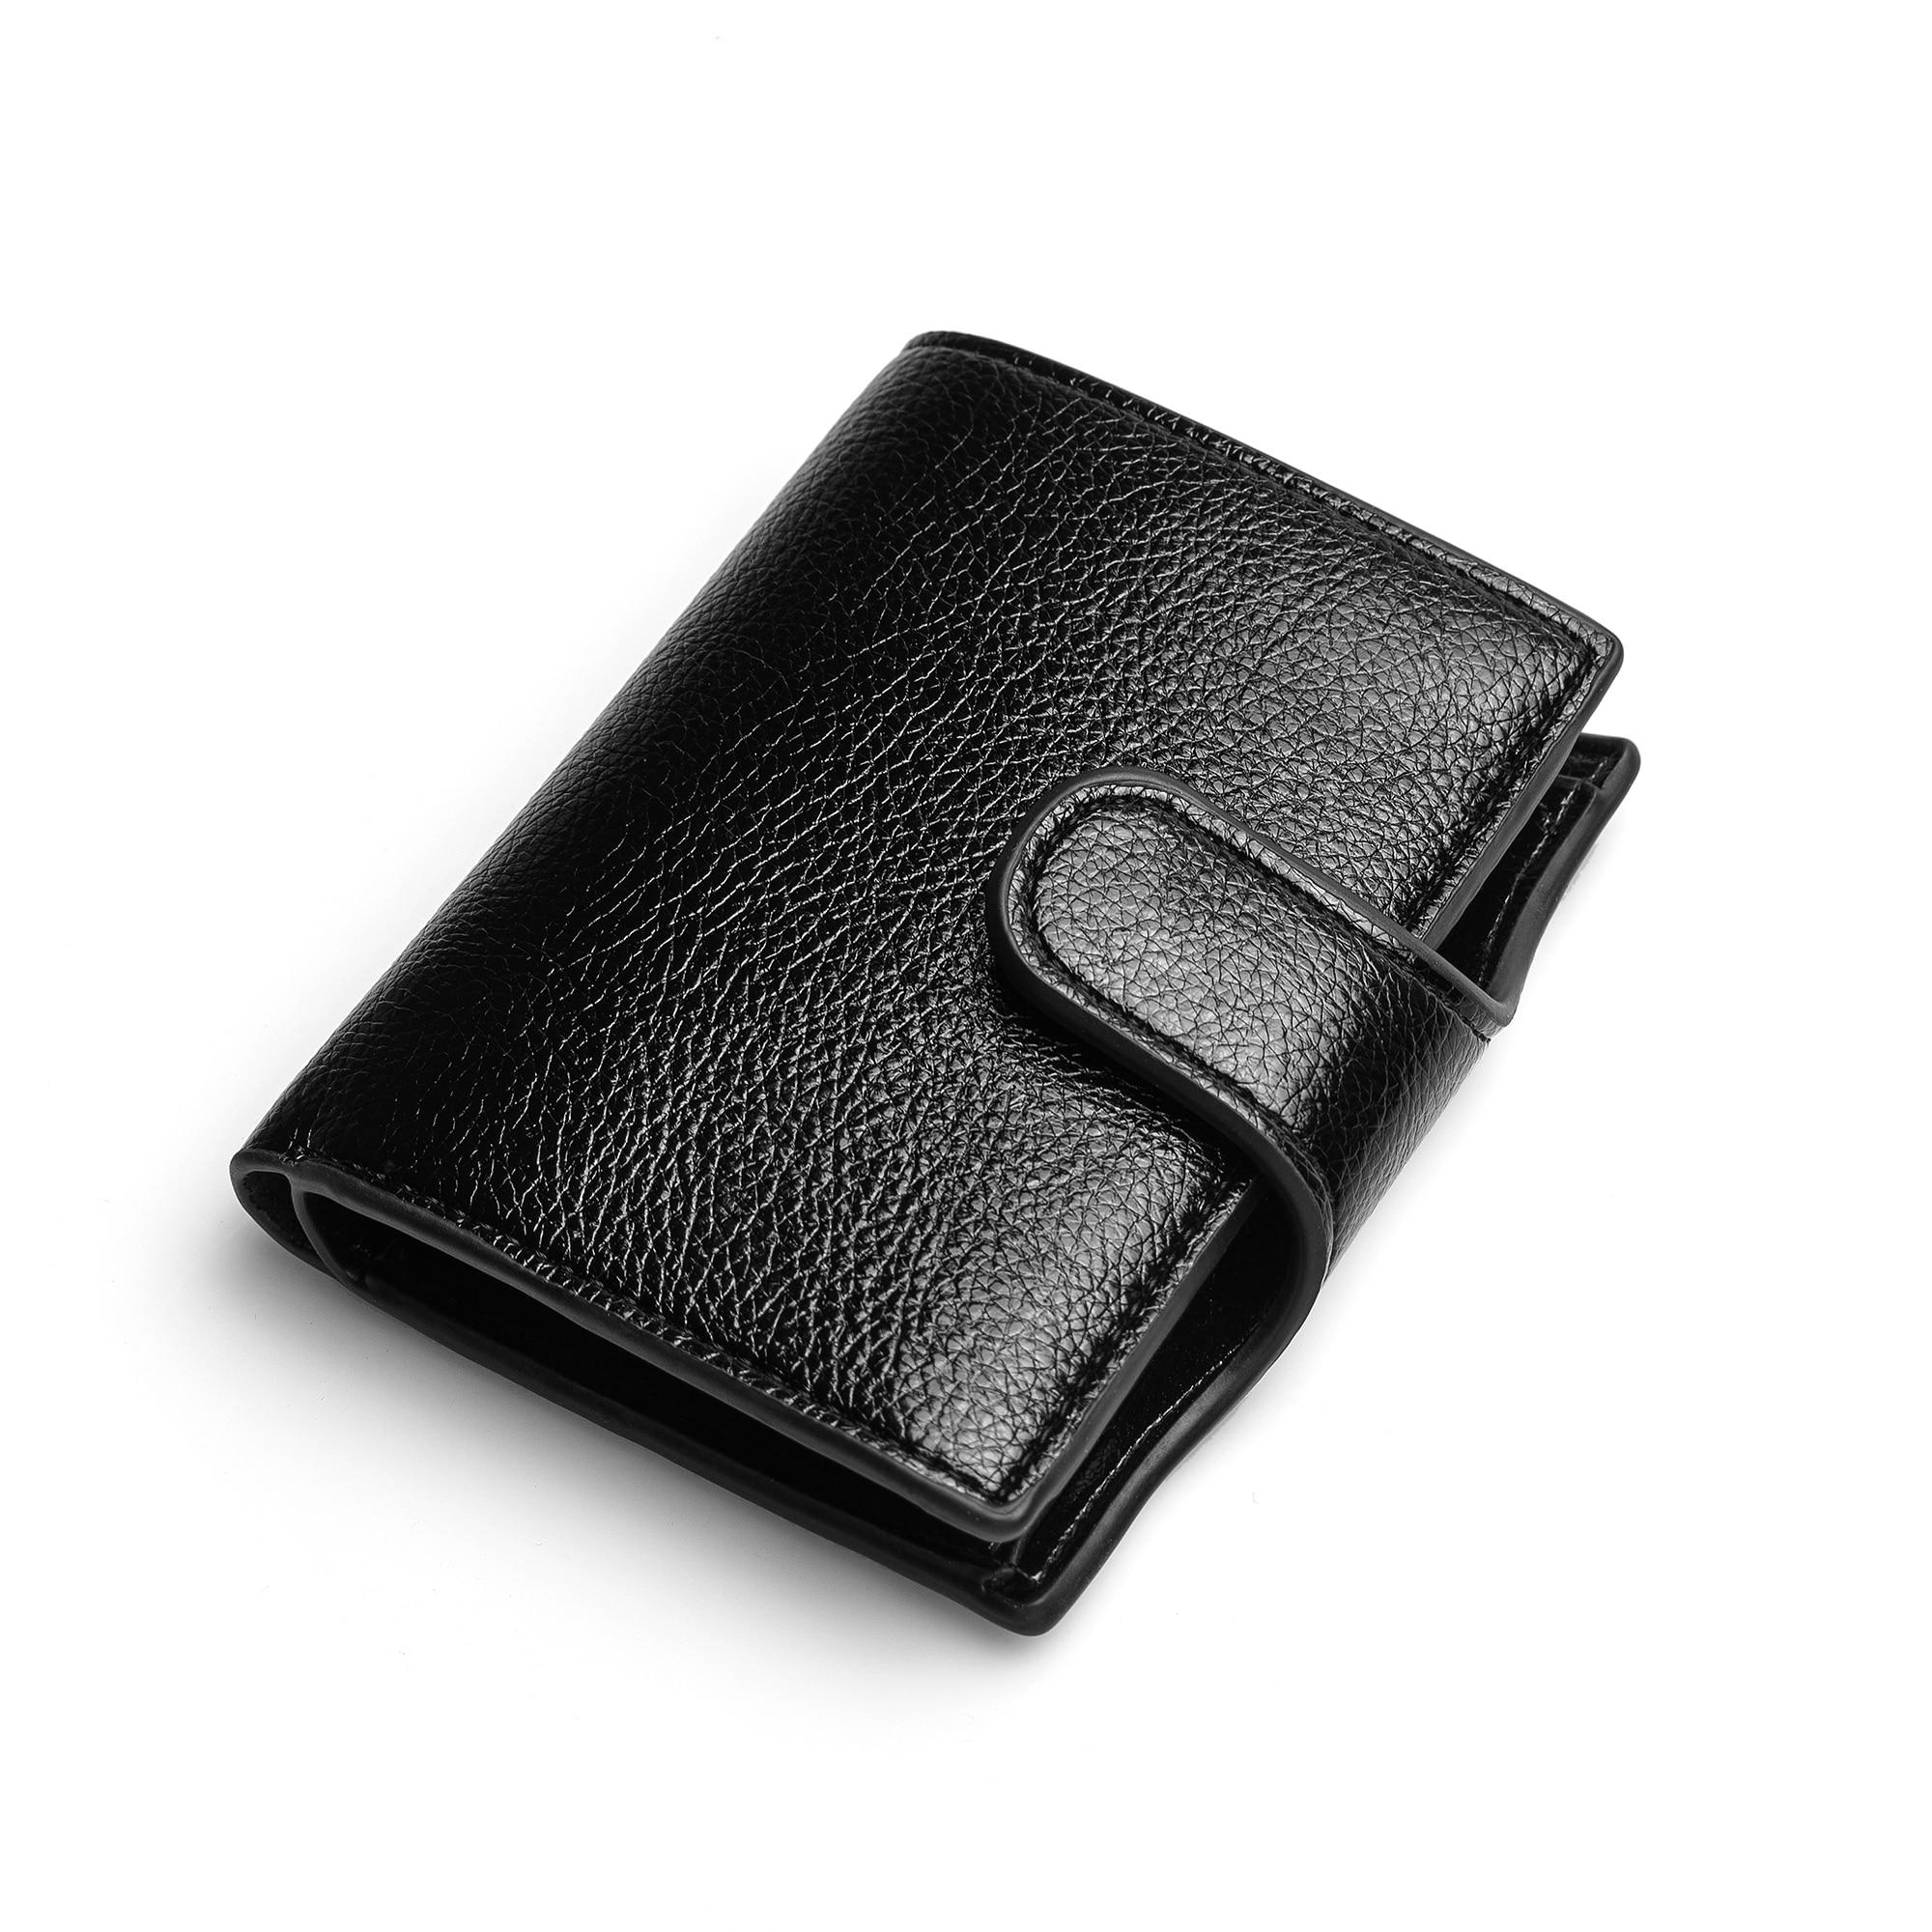 BISI GORO 2021 Wallet Women Small Unisex Vintage Solid Money Bag PU Leather Men Card Holder Smart Slim RFID Ladies Card Case